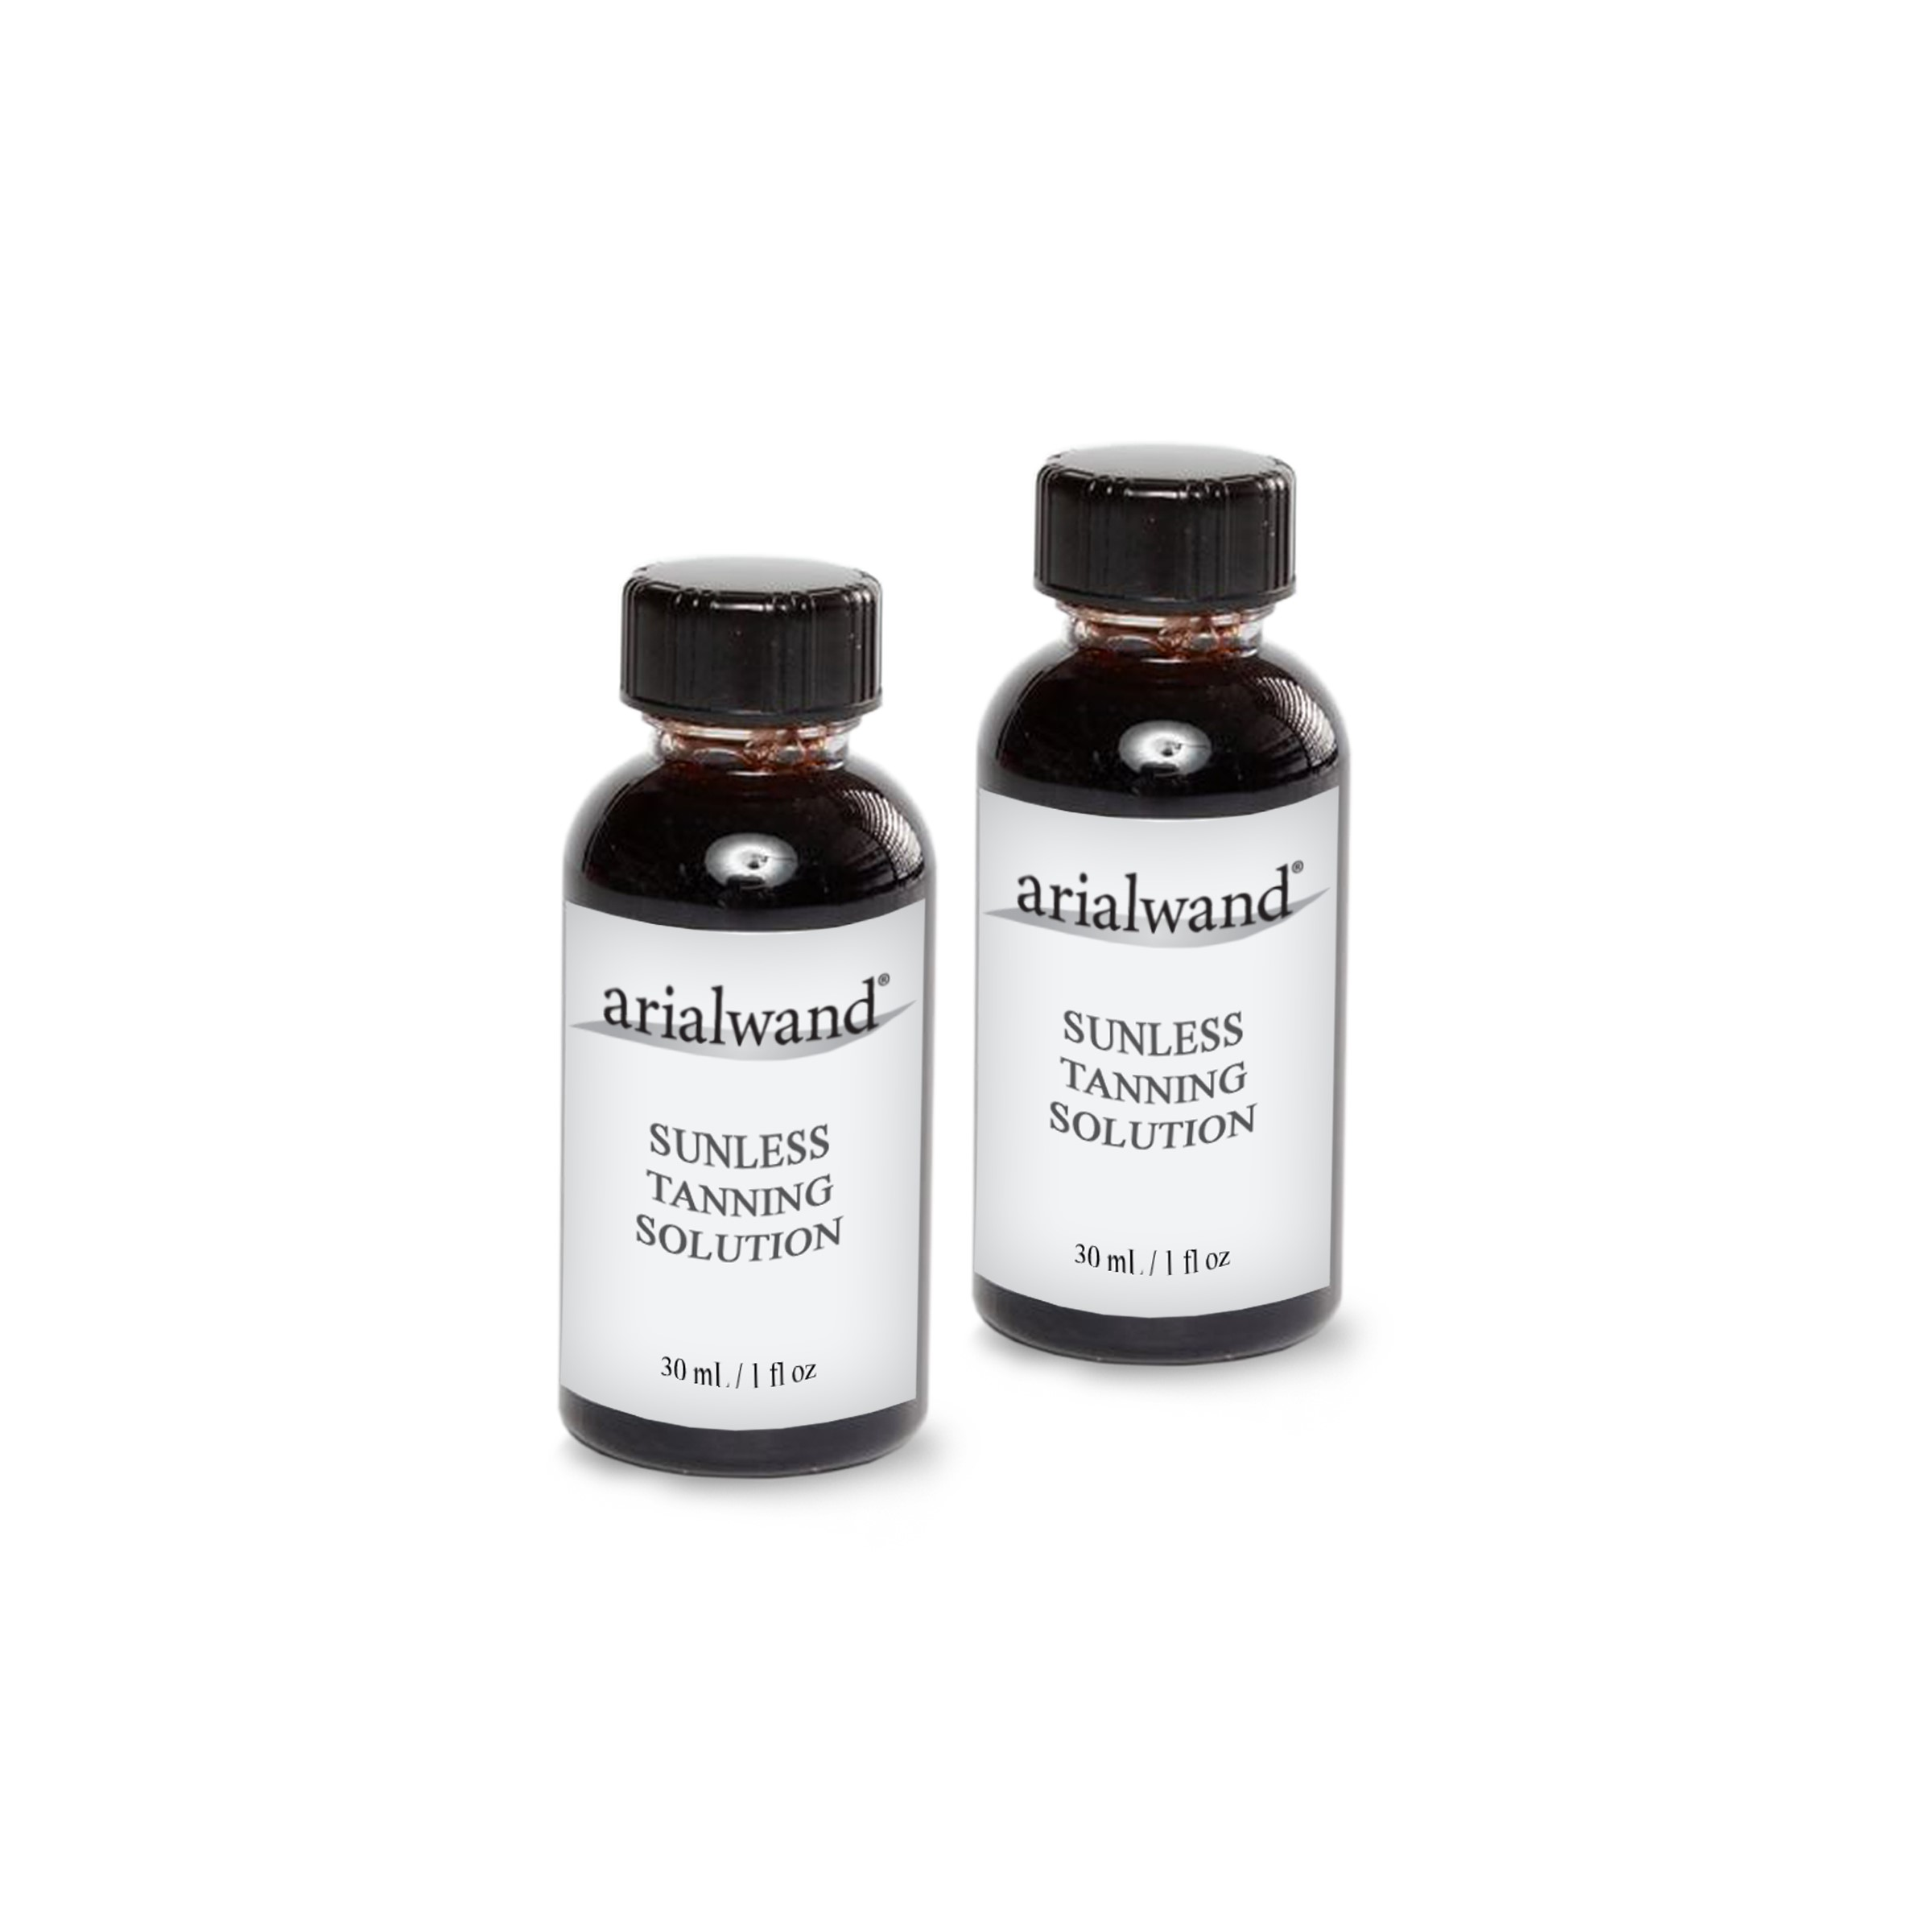 Arialwand Arialwand Sunless Tanning Solution System Refills Medium, 2 Ct